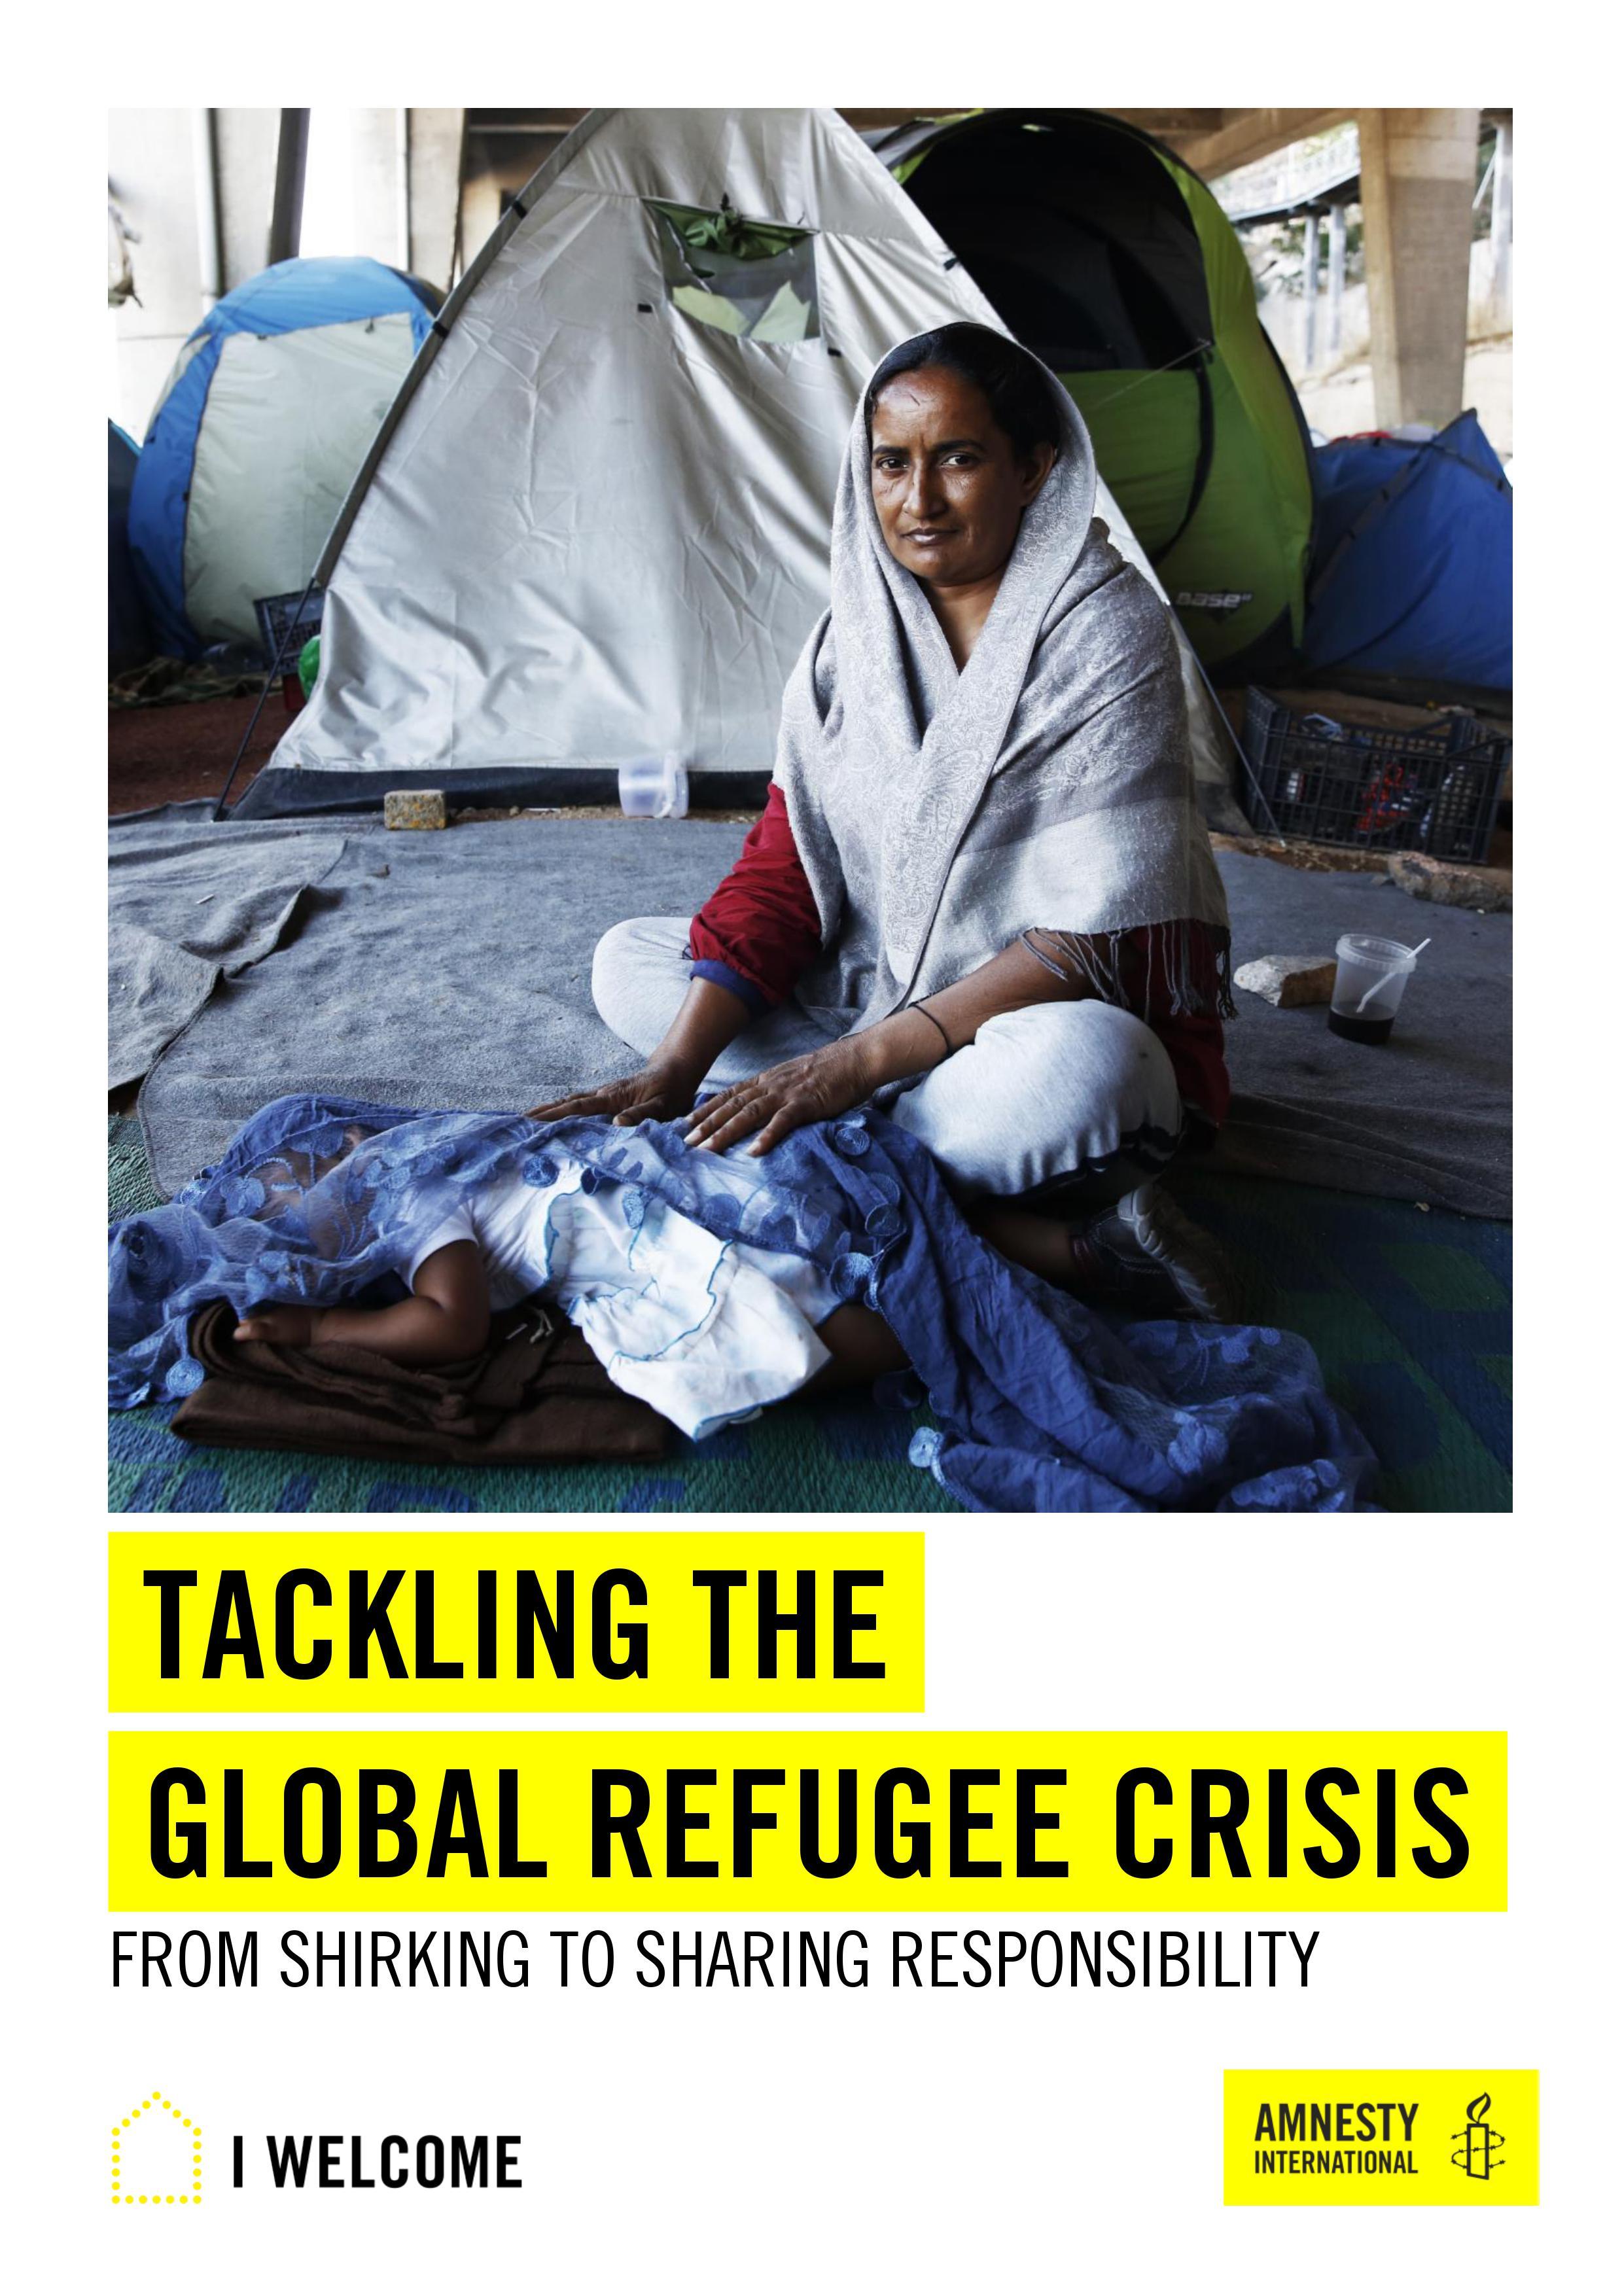 Bericht zur globalen Flüchtlingskrise (e oder f) zur Ausleihe